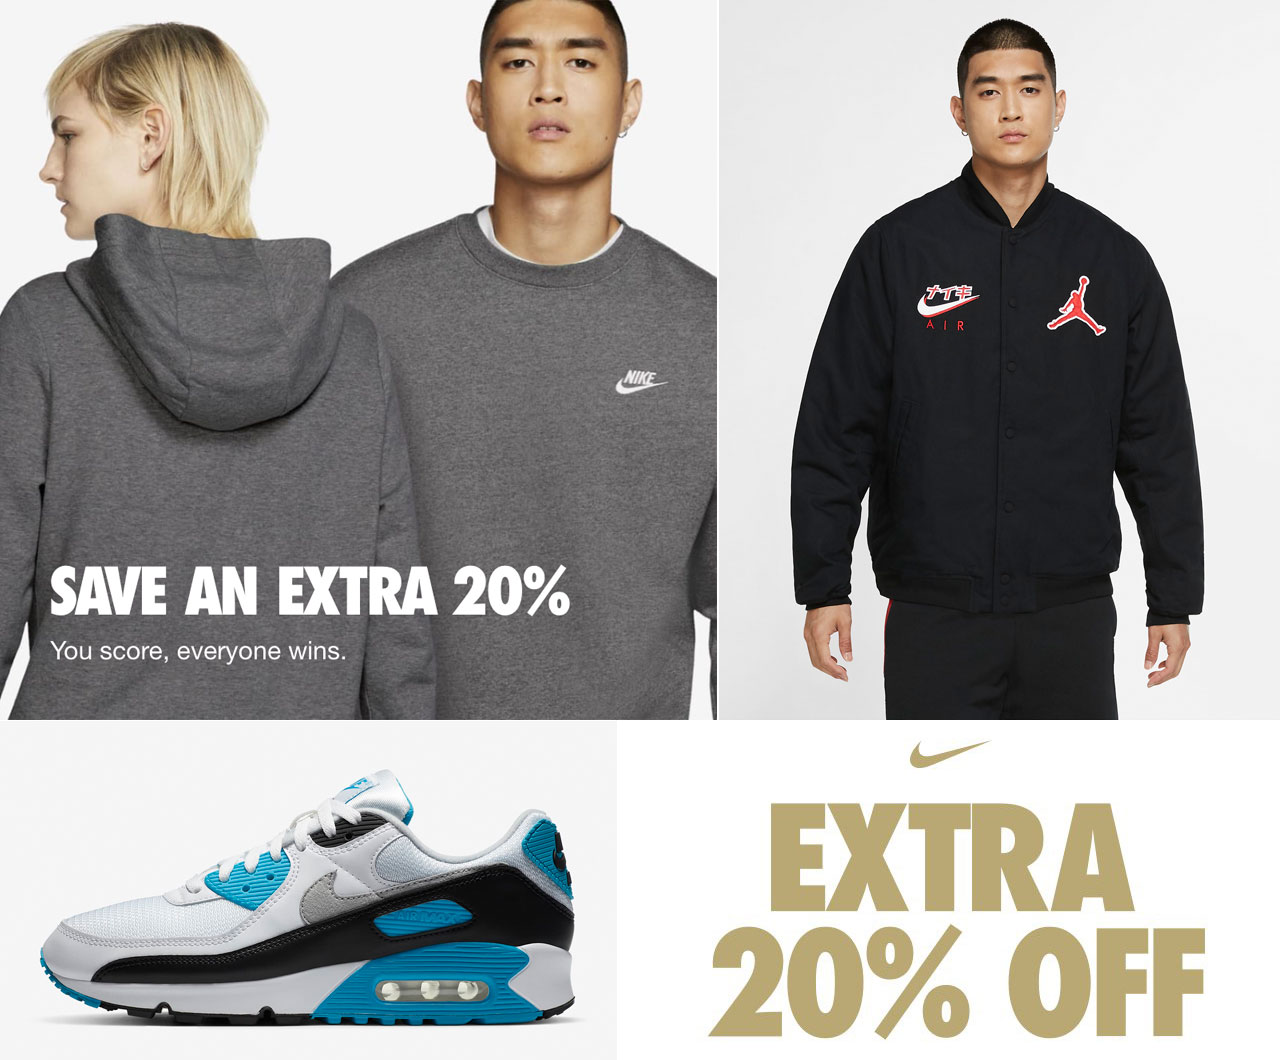 nike-black-friday-2020-sale-sneakers-apparel